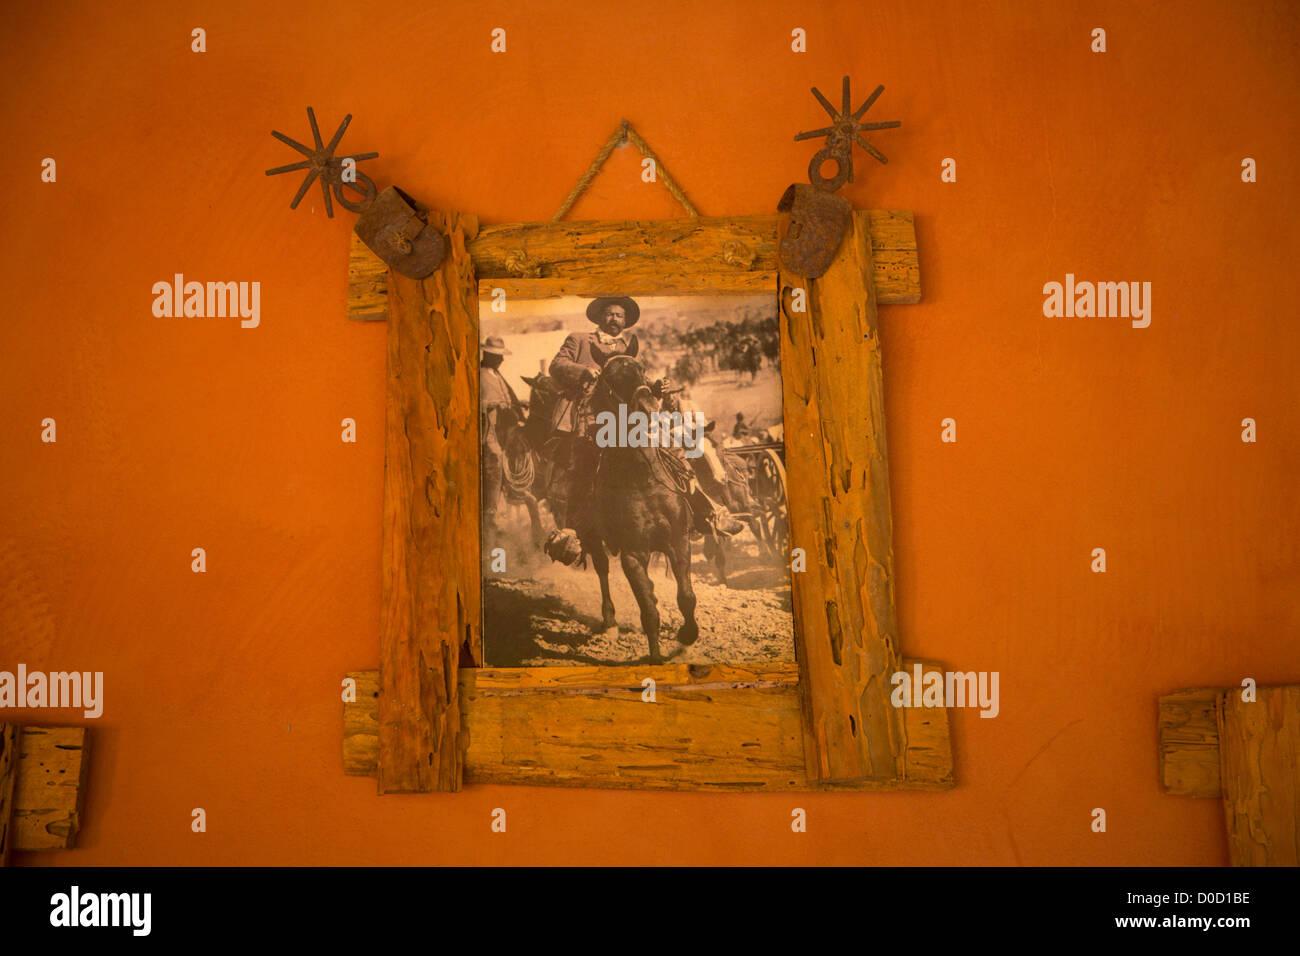 Pancho Villa photograph, El Tuito, Costalegre, Jalisco, Mexico - Stock Image